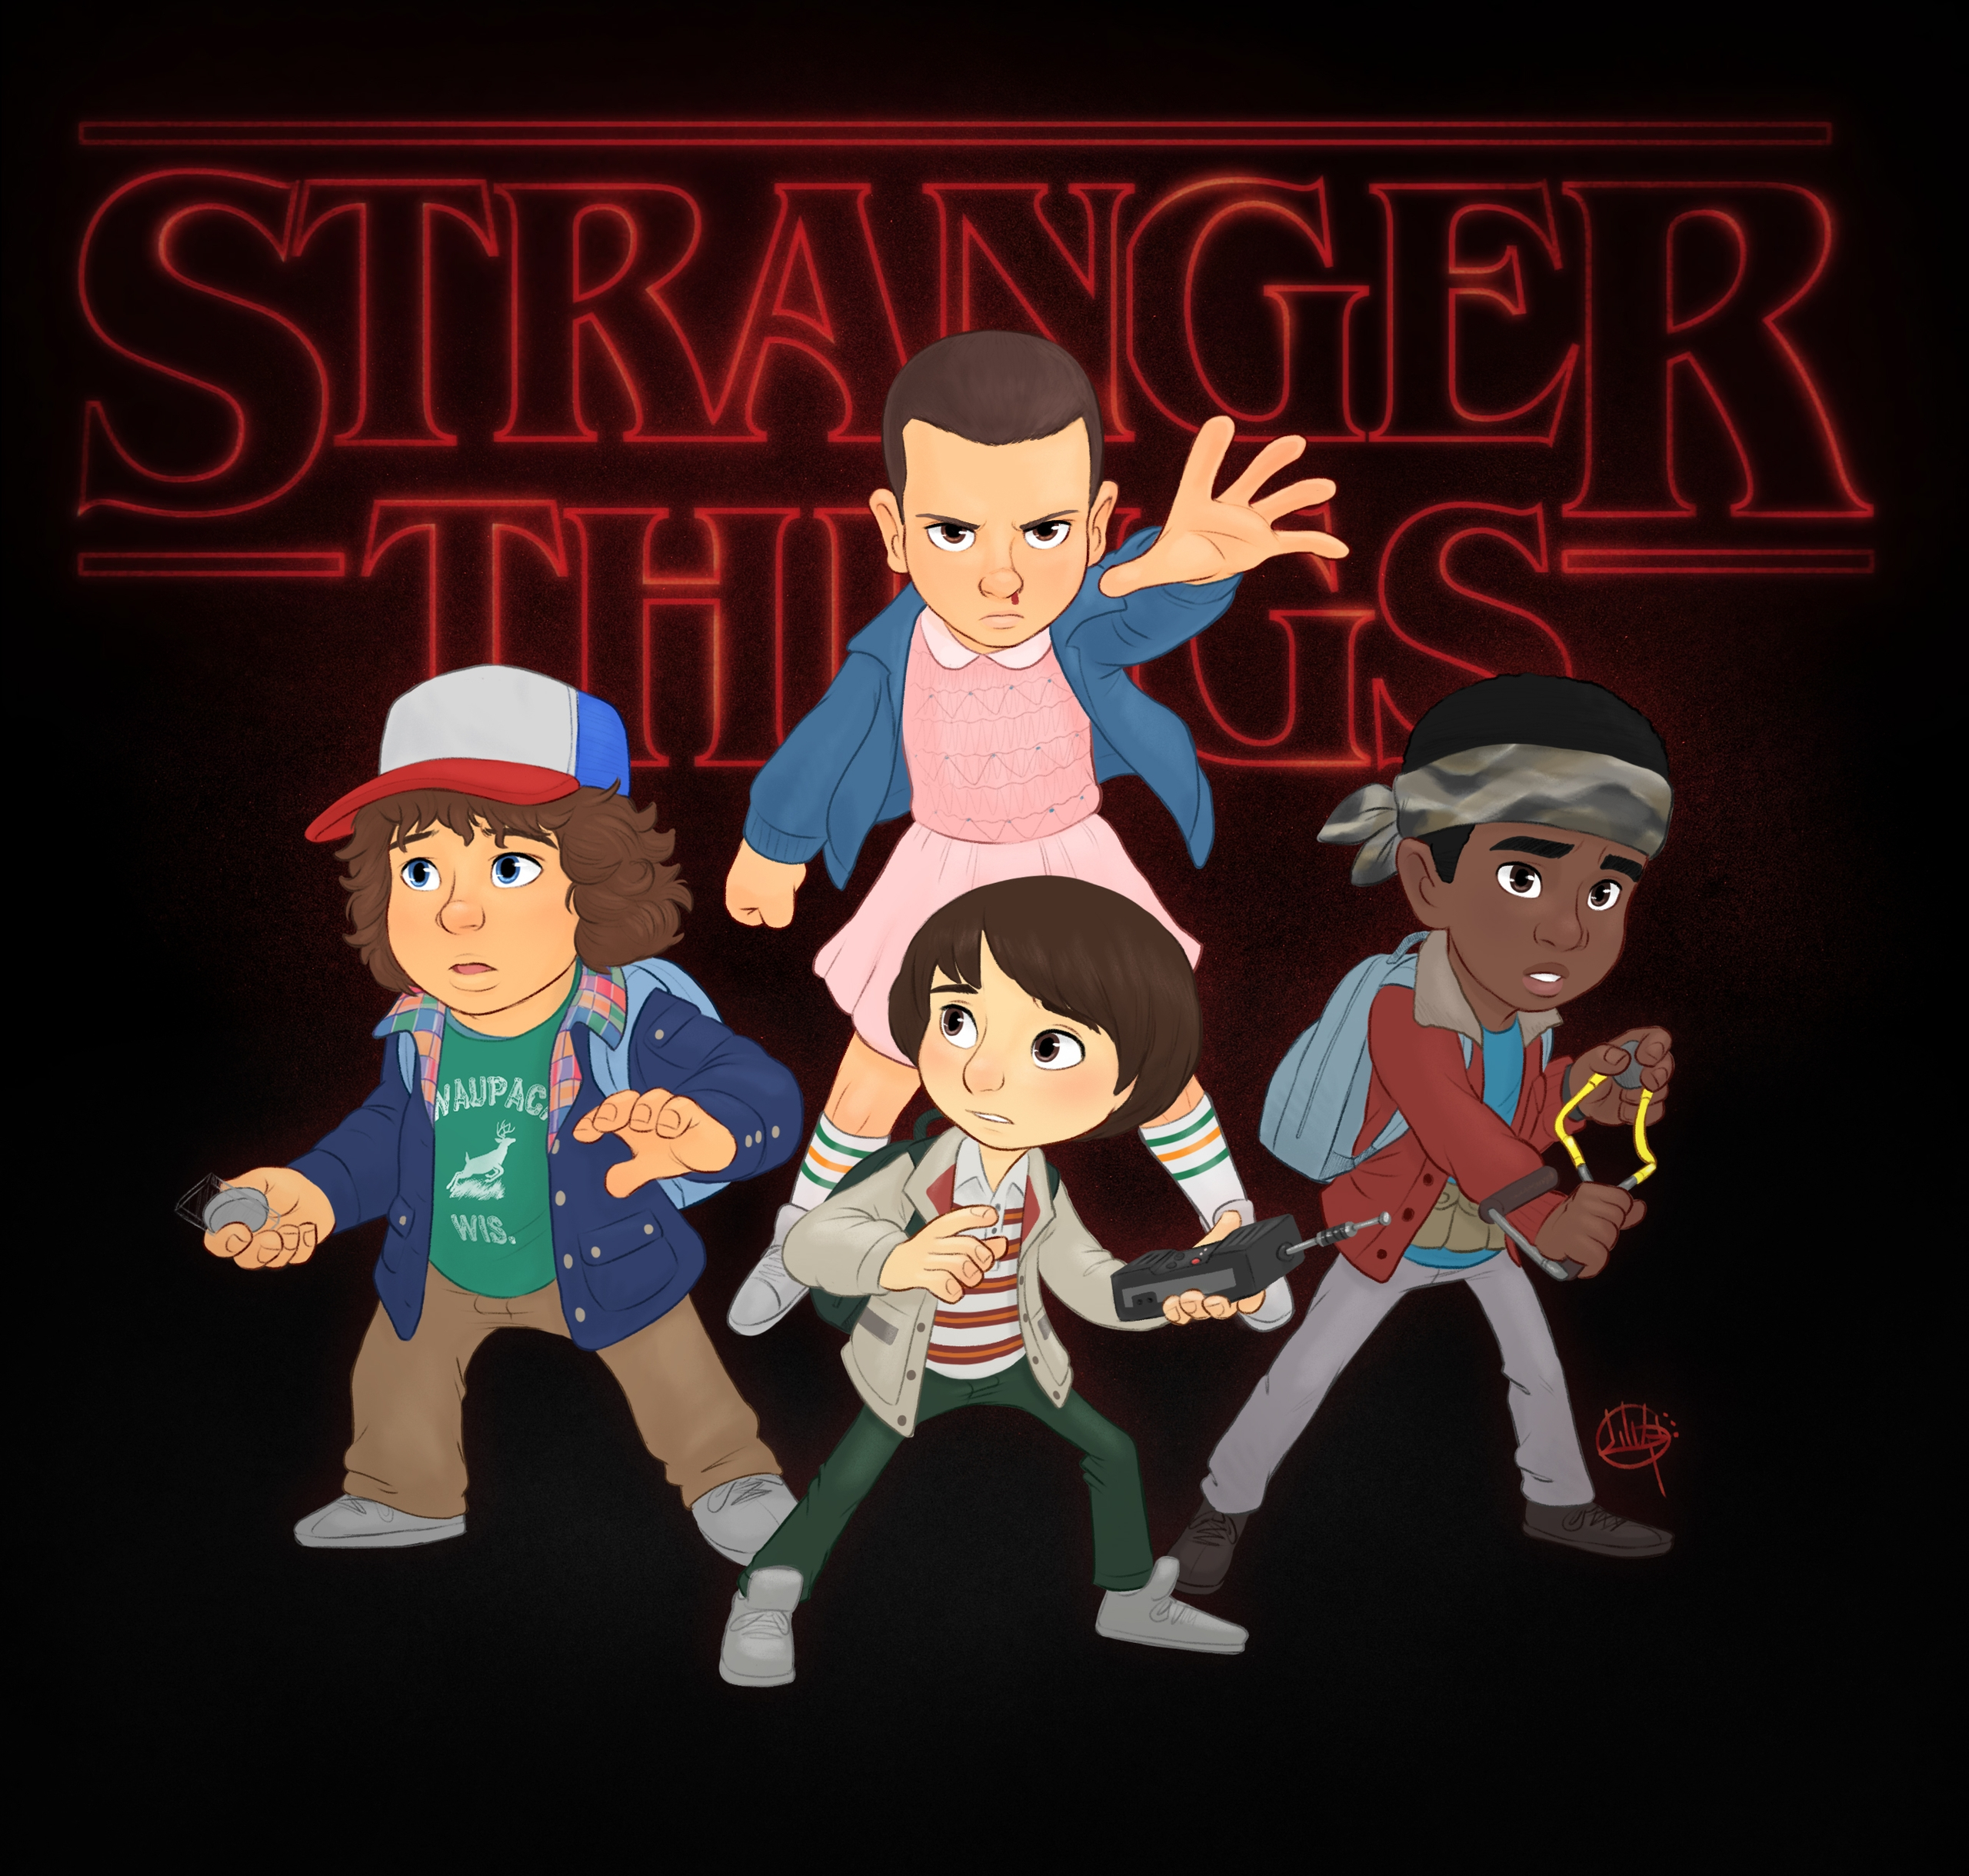 Stranger - luigil-2352 | ello